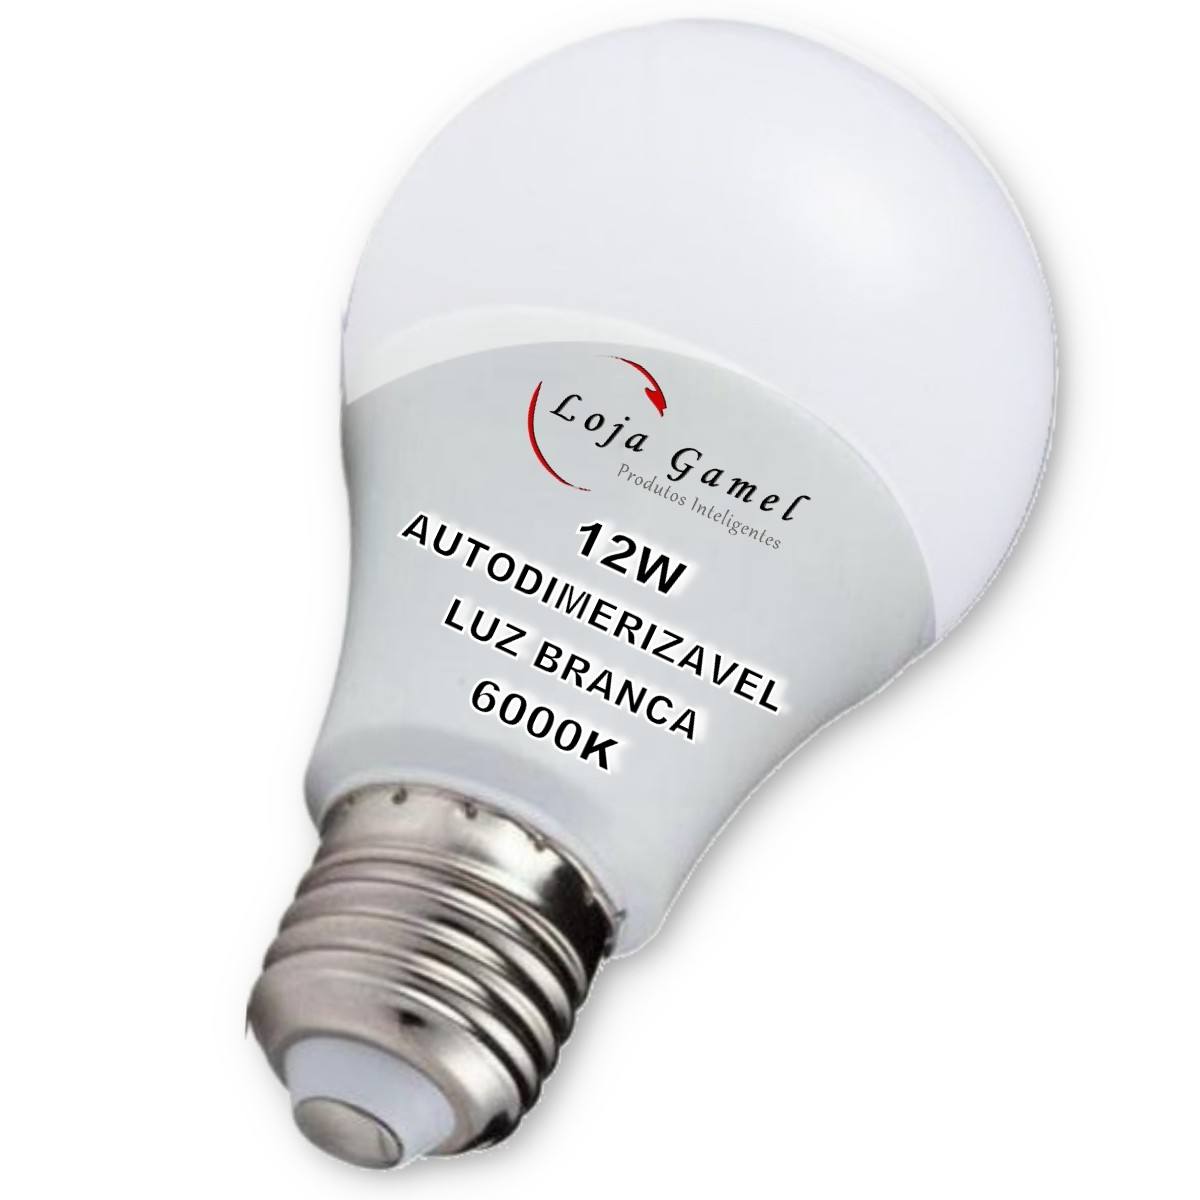 Foto5 - Lâmpada LED Bulbo Autodimerizável 12W Luz Branca 6000K Kit 10un